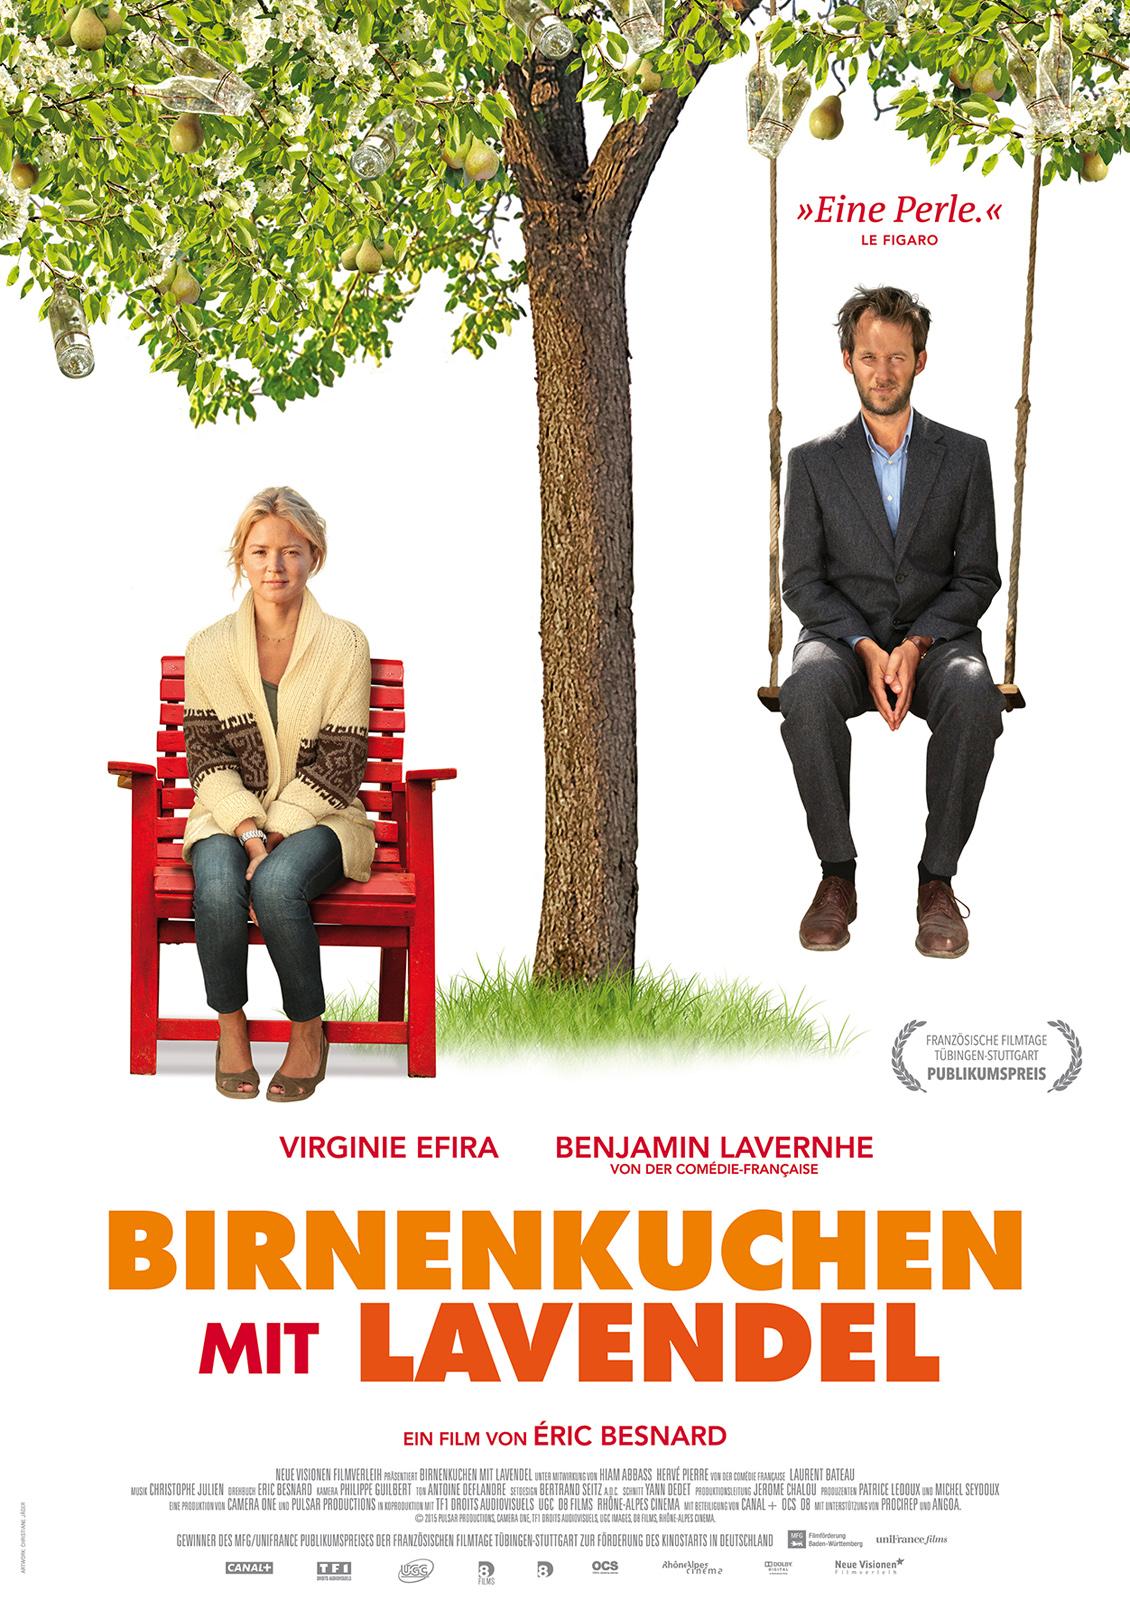 Birnbaum Und Lavendel